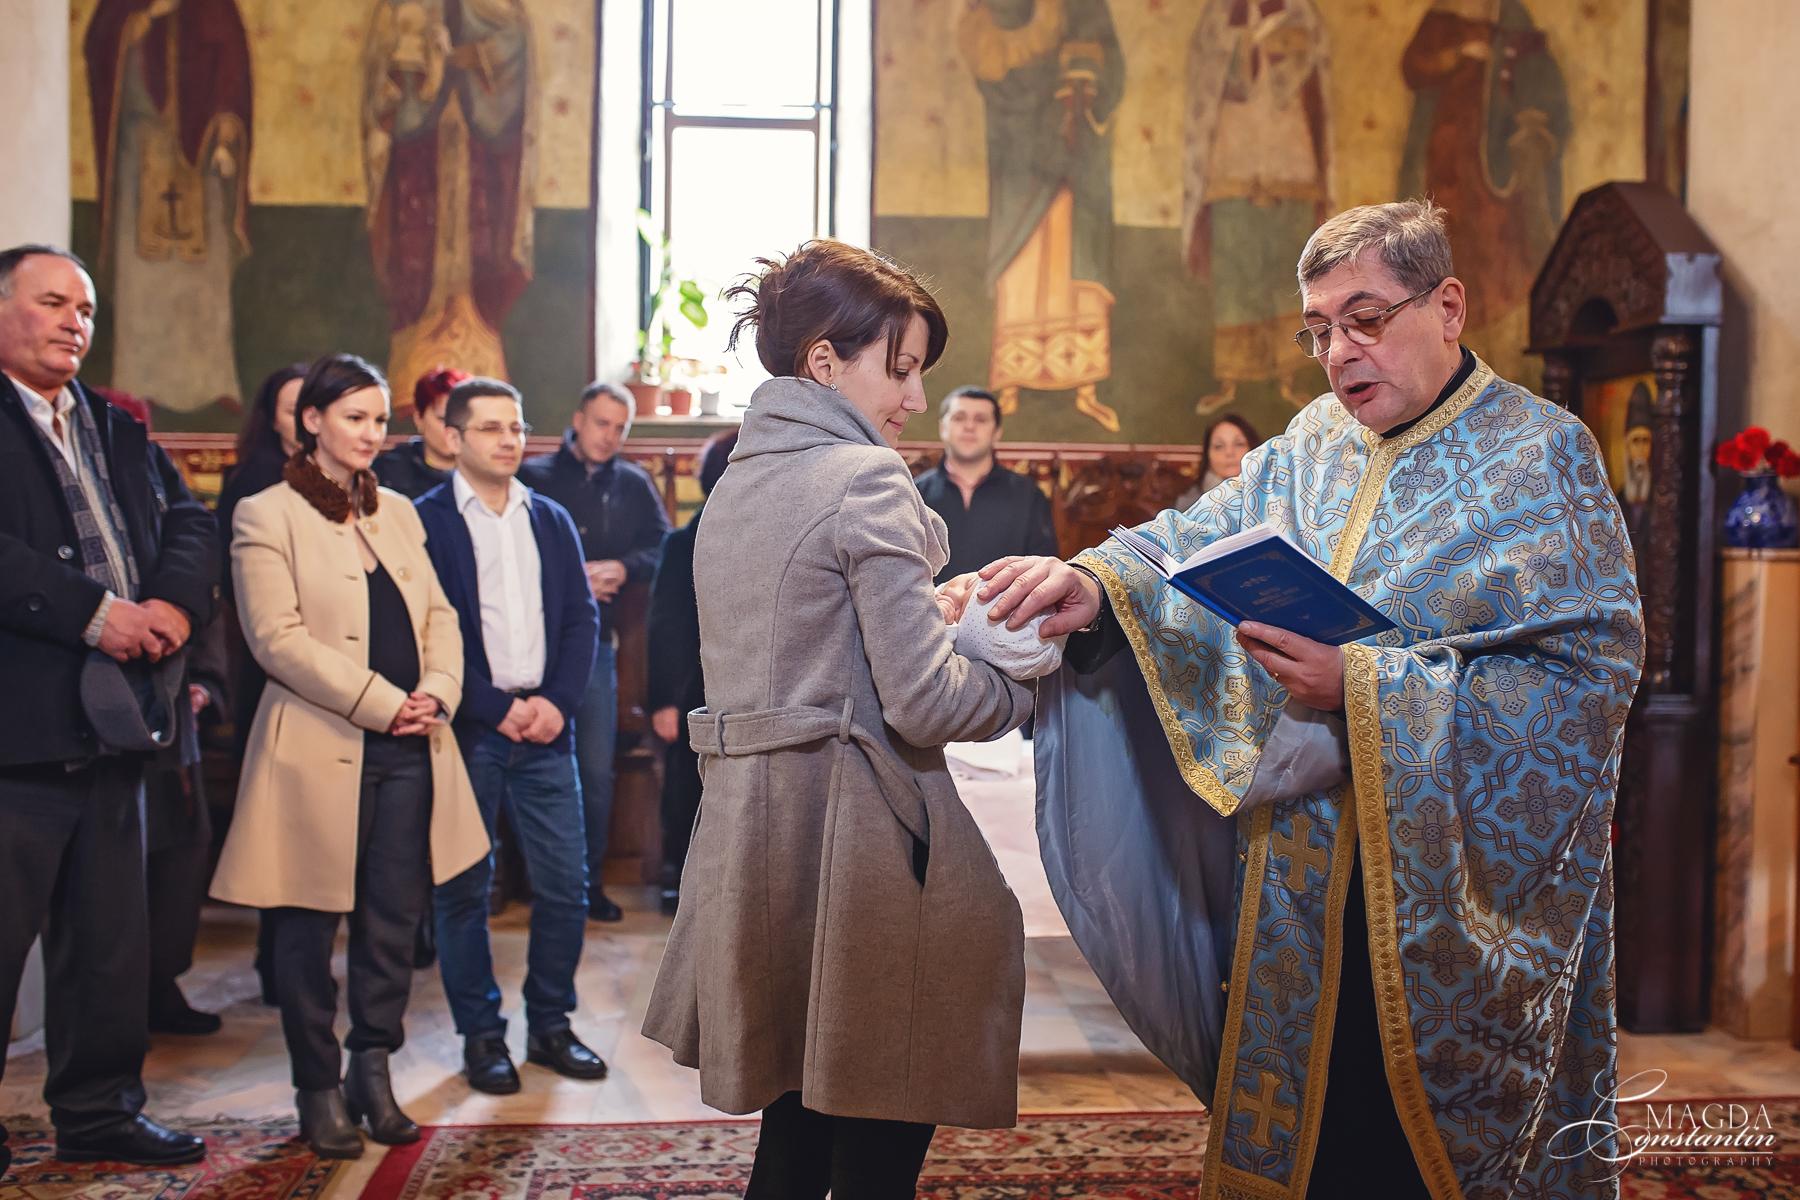 Fotograf la botezul mariei biserica in brate la nasa preotul cu mana pe capul ei